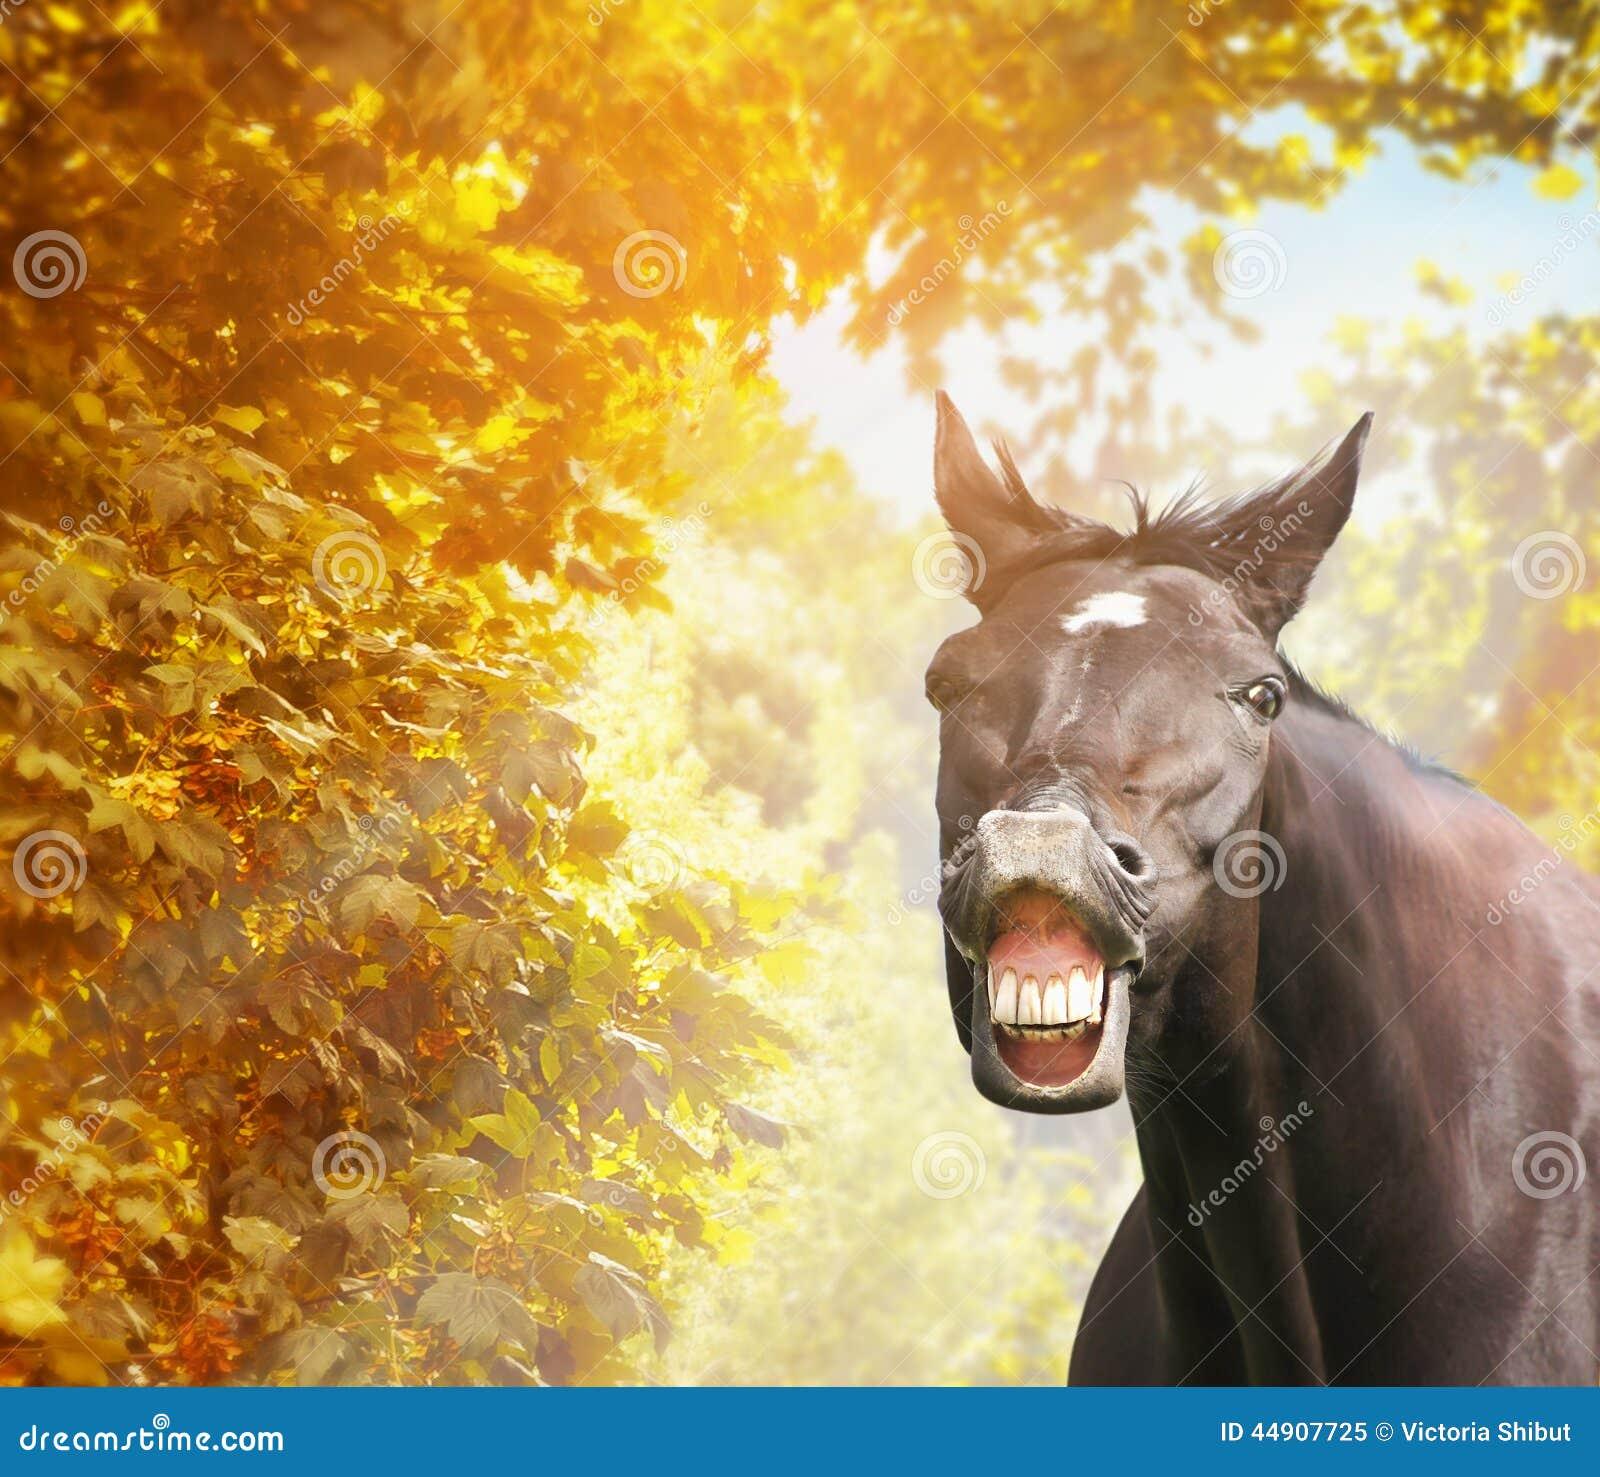 Funny horse in autumn foliage in sunshine